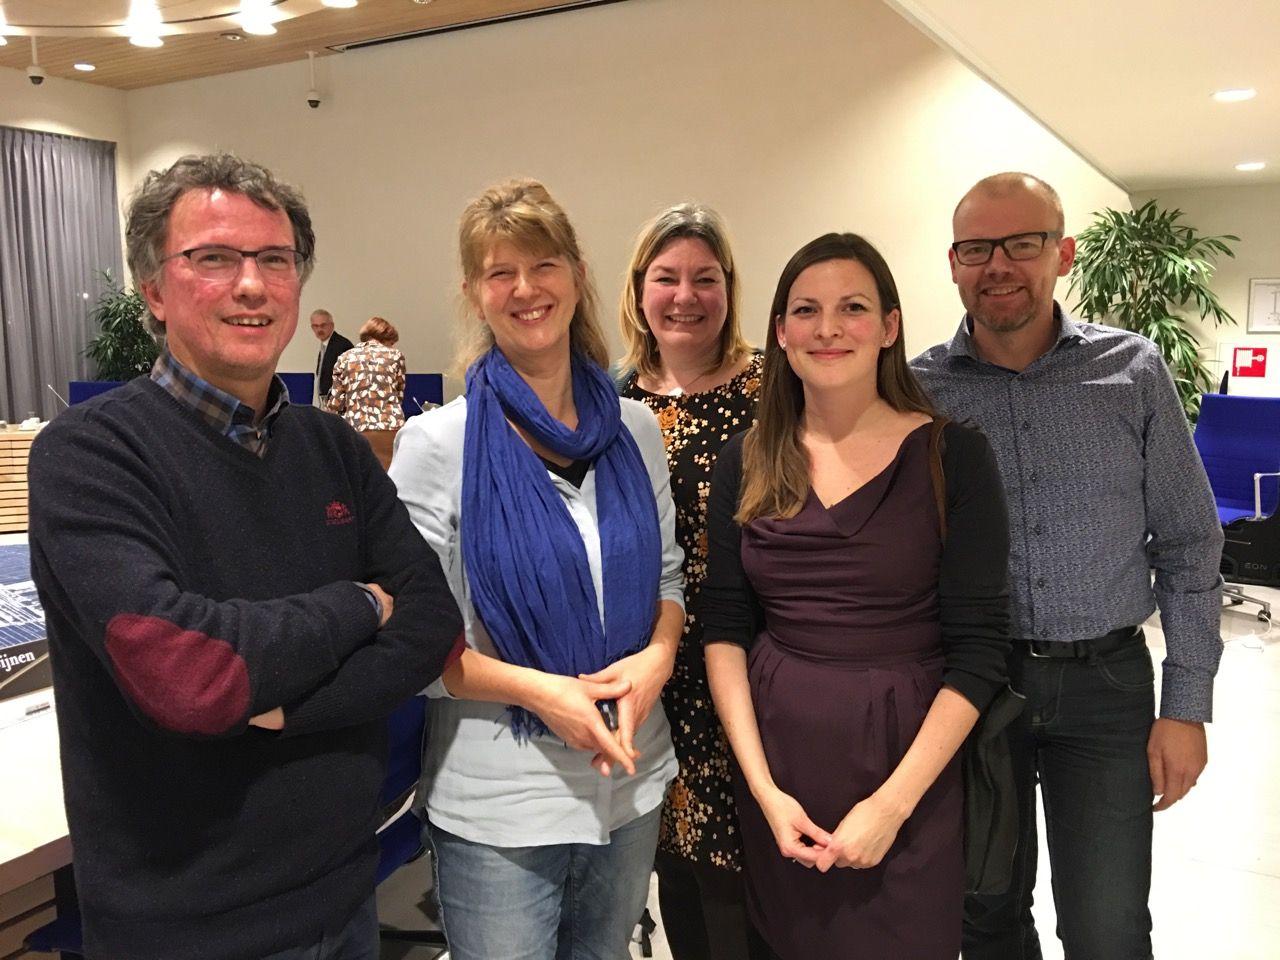 PvdA en GroenLinks gaan meer samenwerken